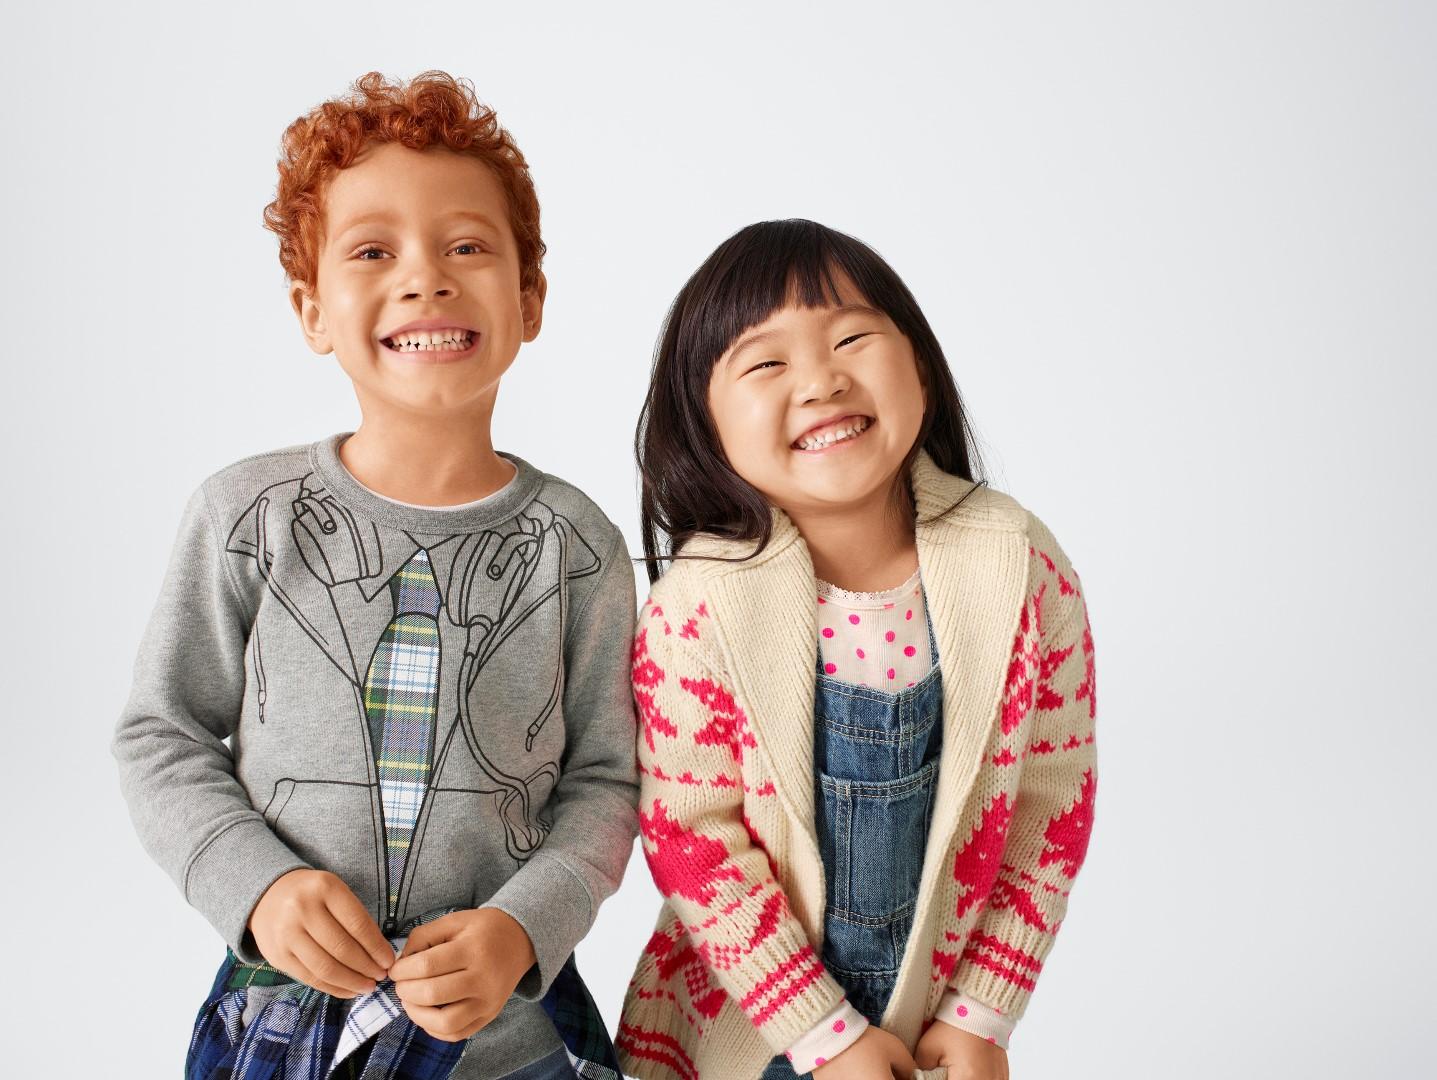 Gap Kids Sarah Jessica Parker autunno inverno 2018 2019